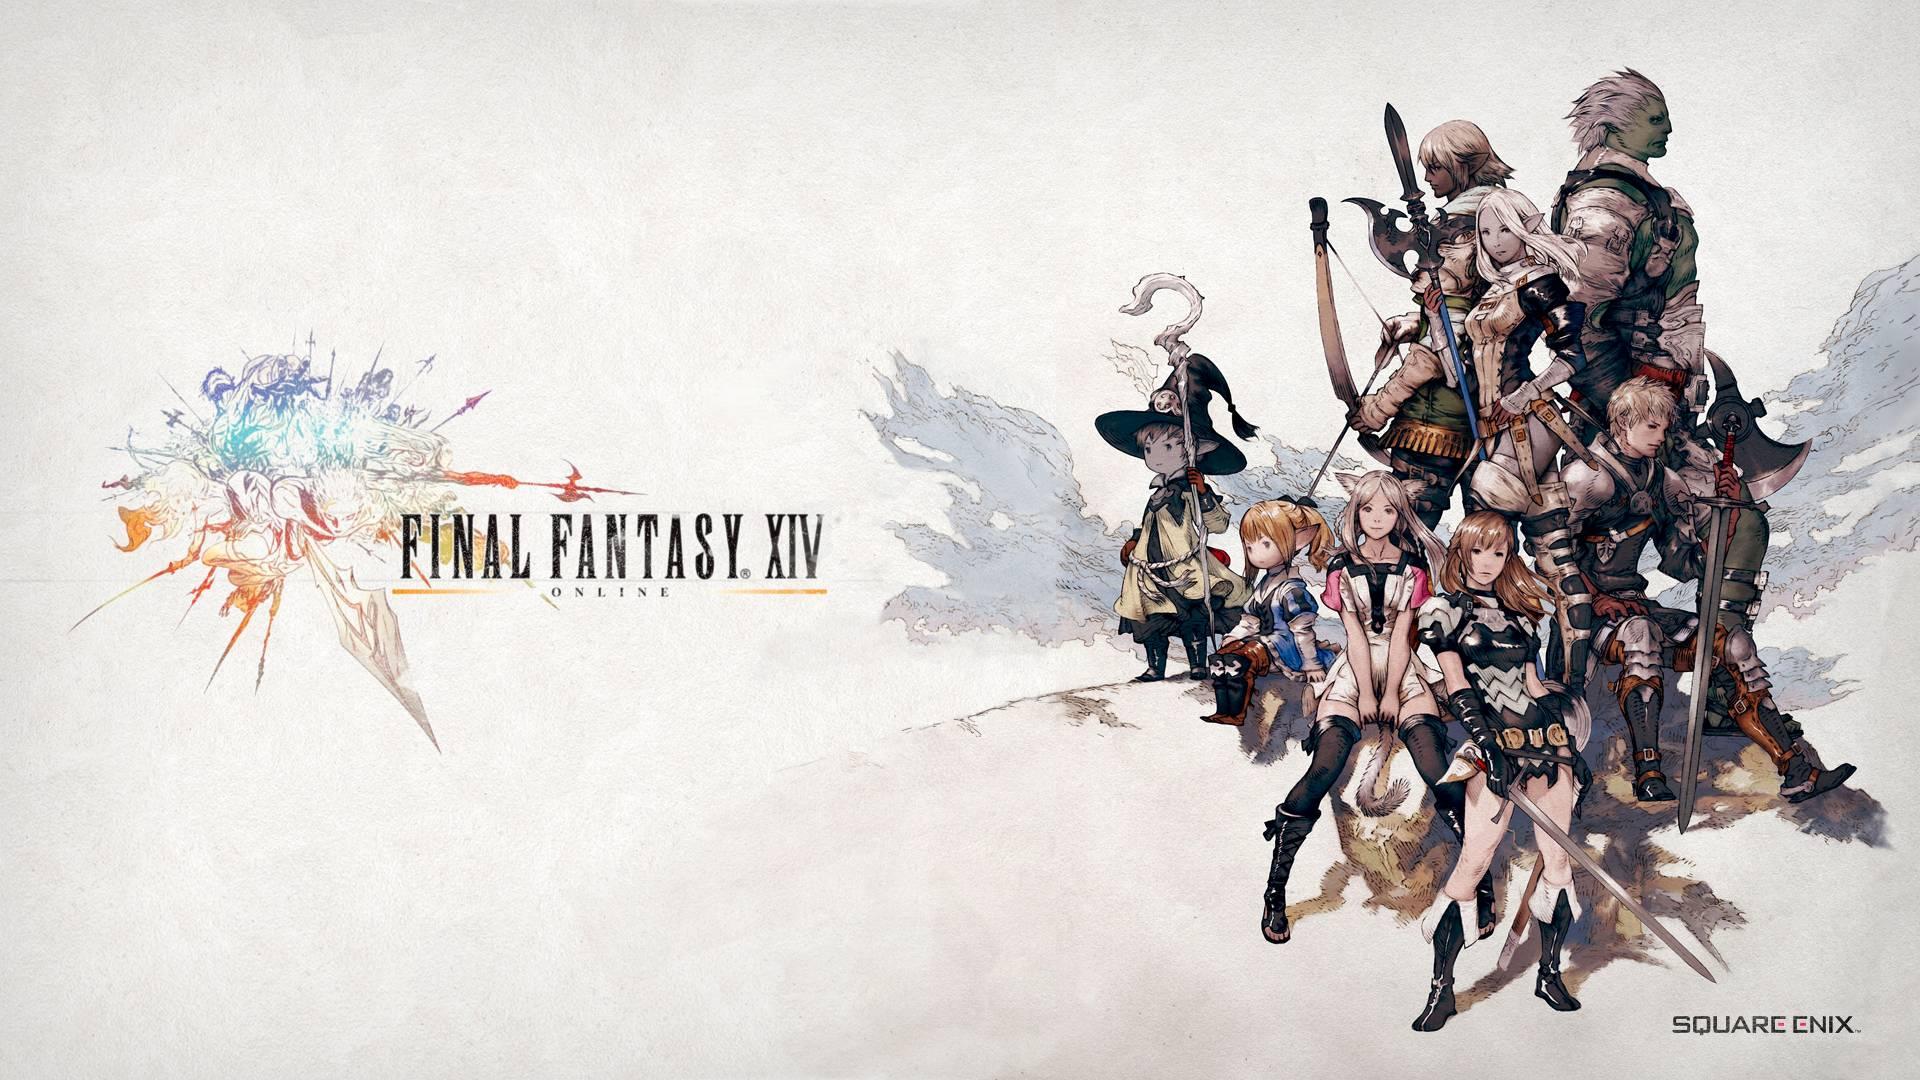 Final Fantasy XIV: FINAL FANTASY XIV Documentary, часть первая: